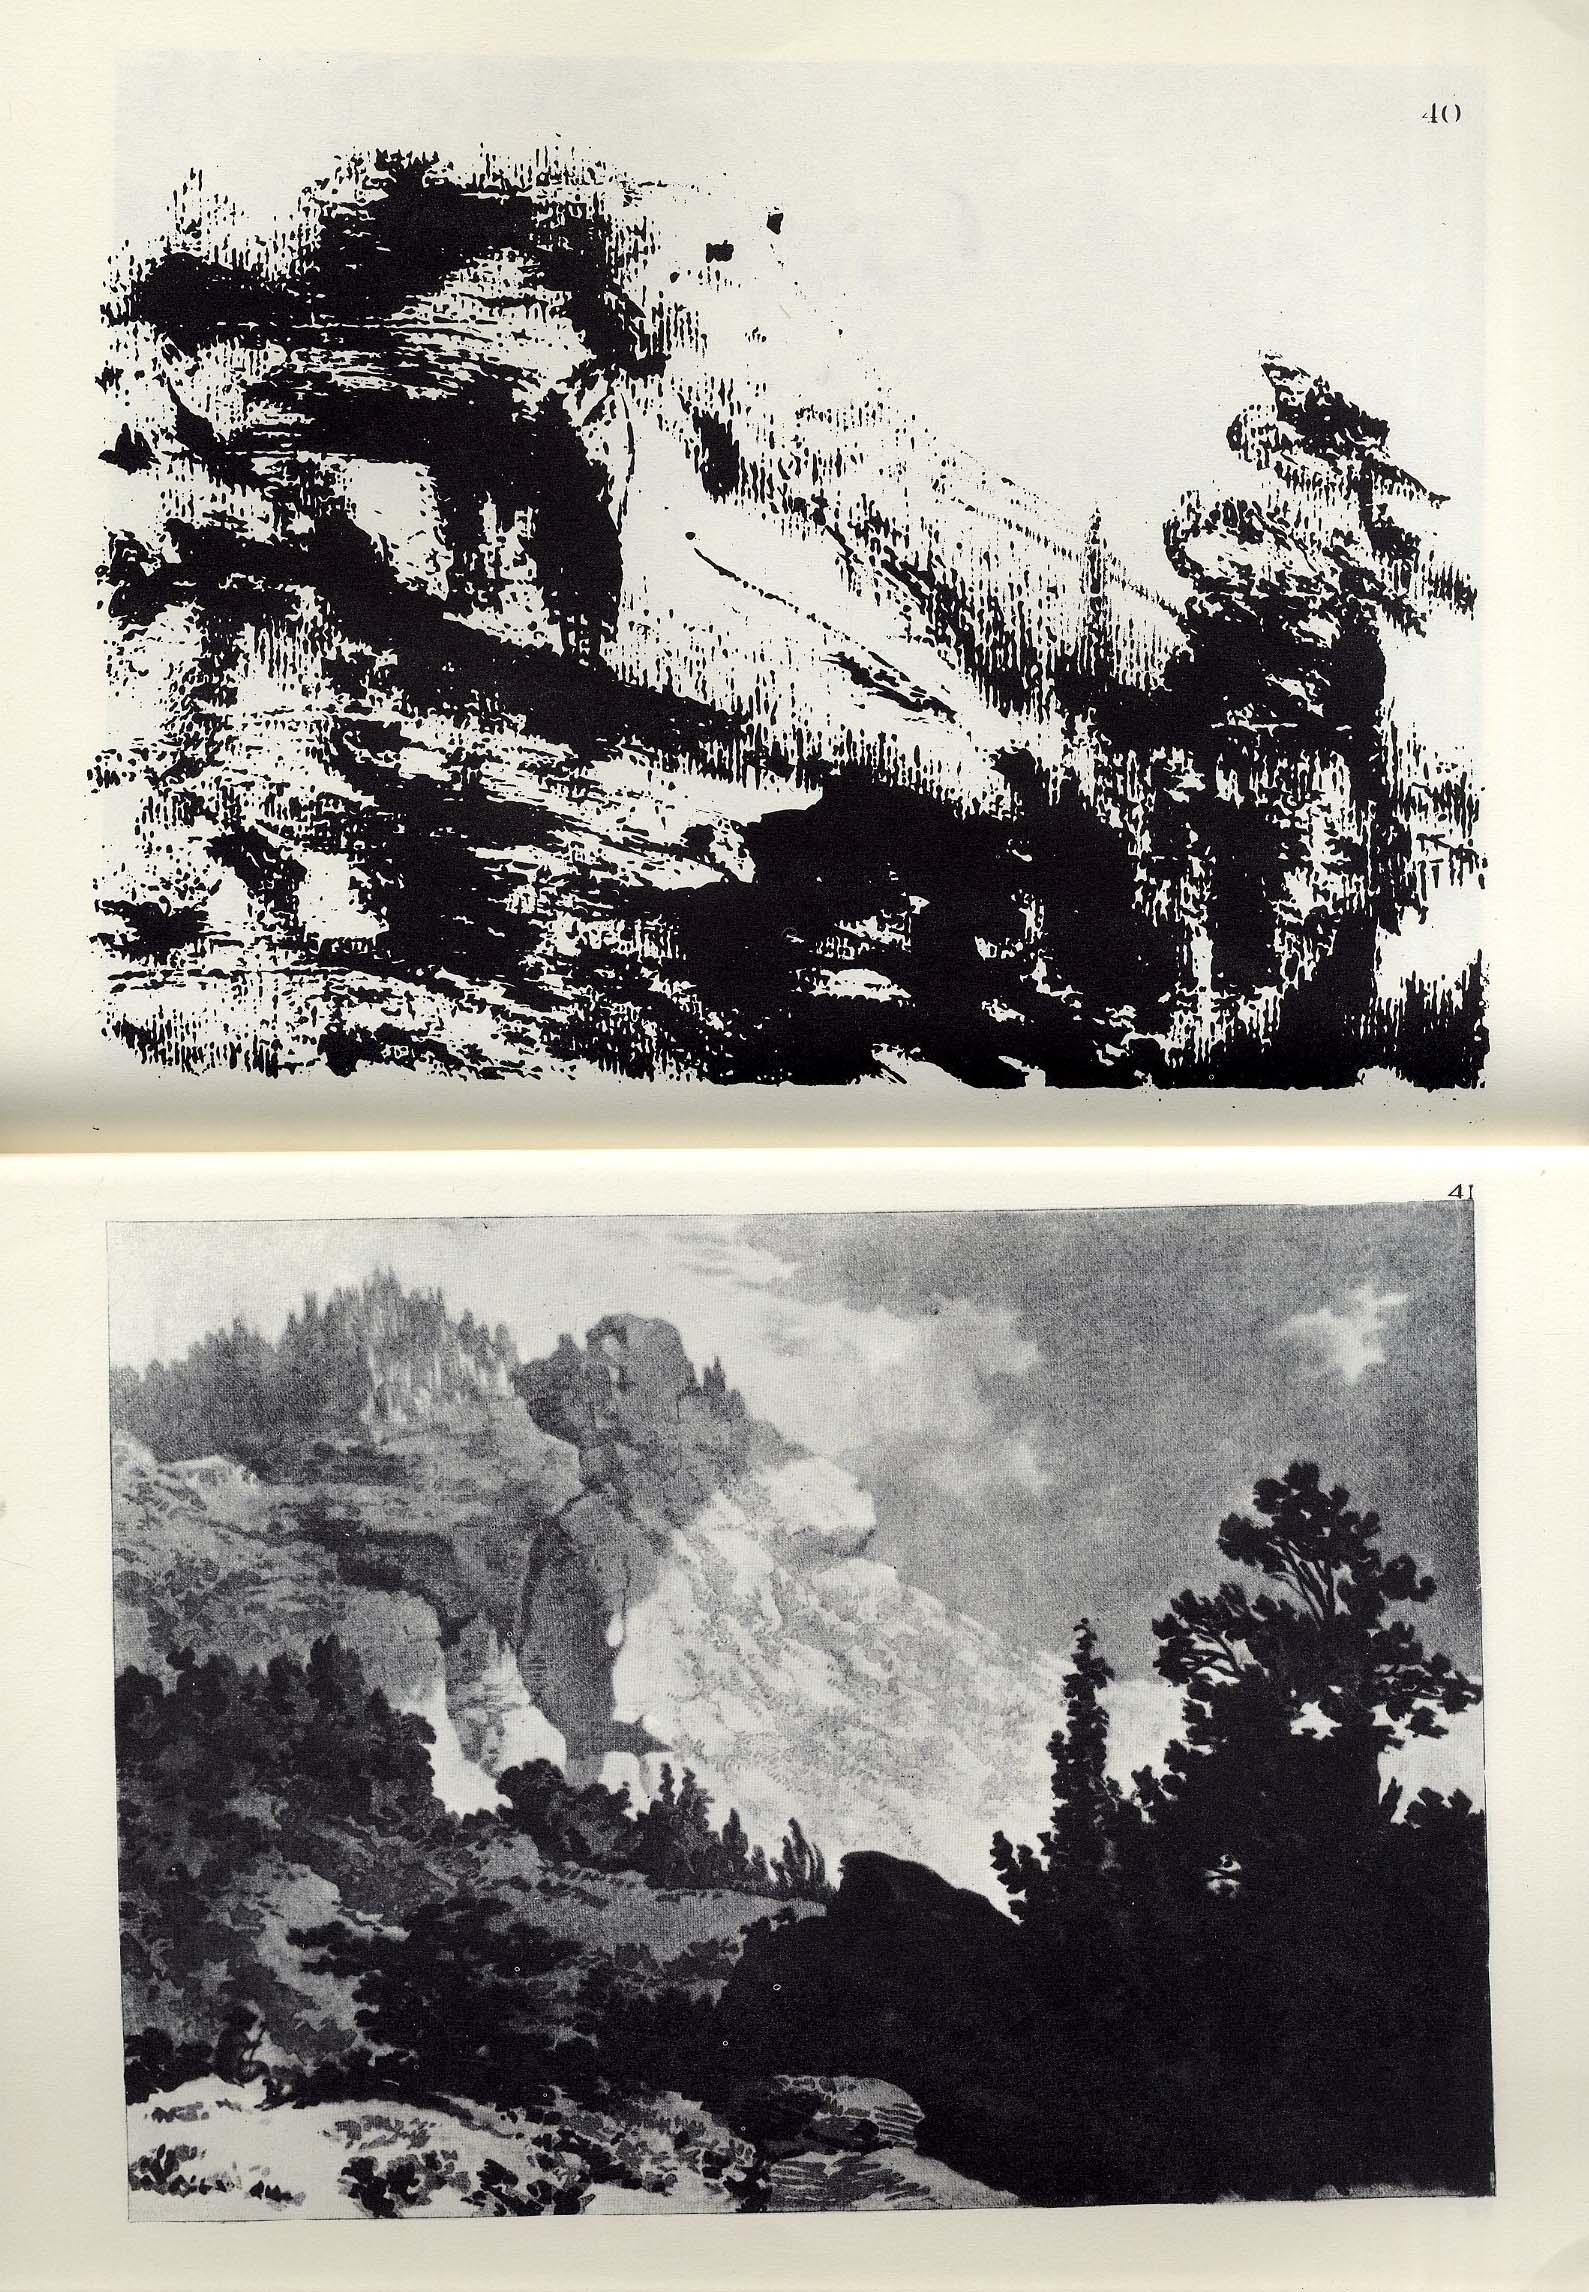 Alexander Cozens, A New Method of Landscape 1785